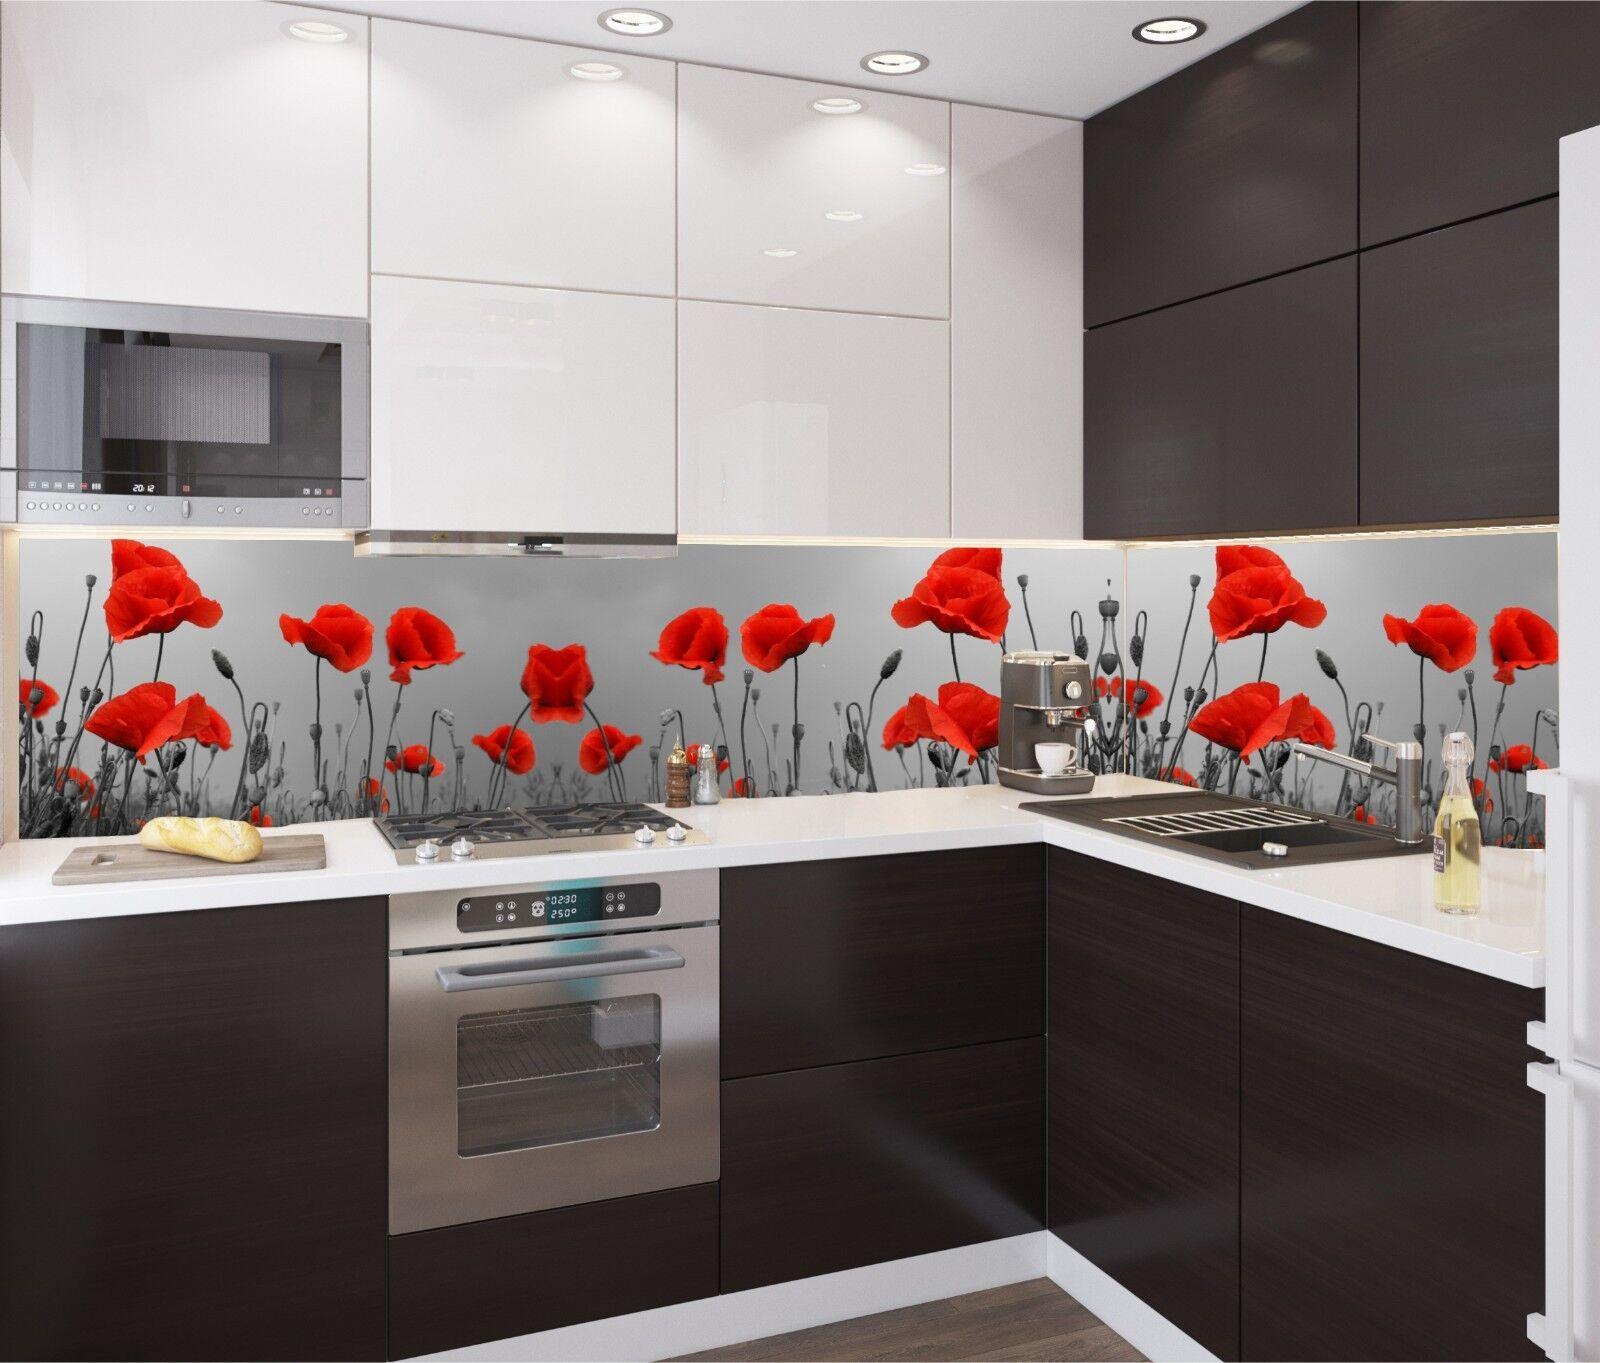 Küchenrückwand SP354 MohnBlaume Spritzschutz Fliesenspiegel nach Maß Acrylglas